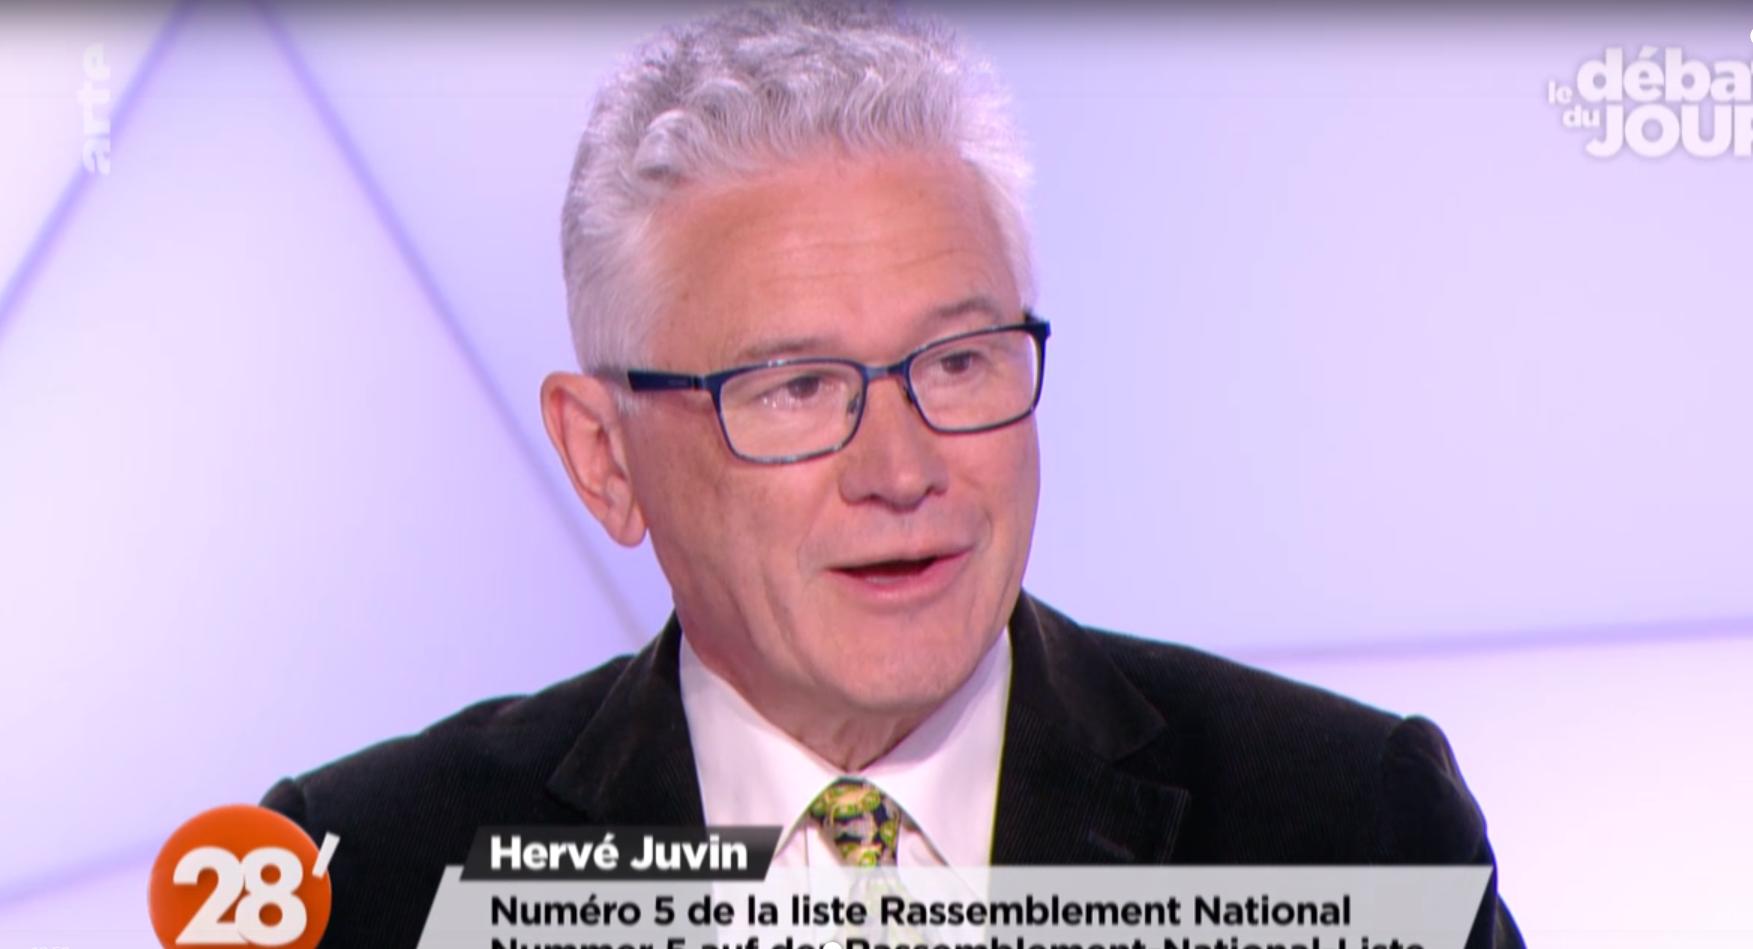 Biodiversité Hervé Juvin 28 minutes